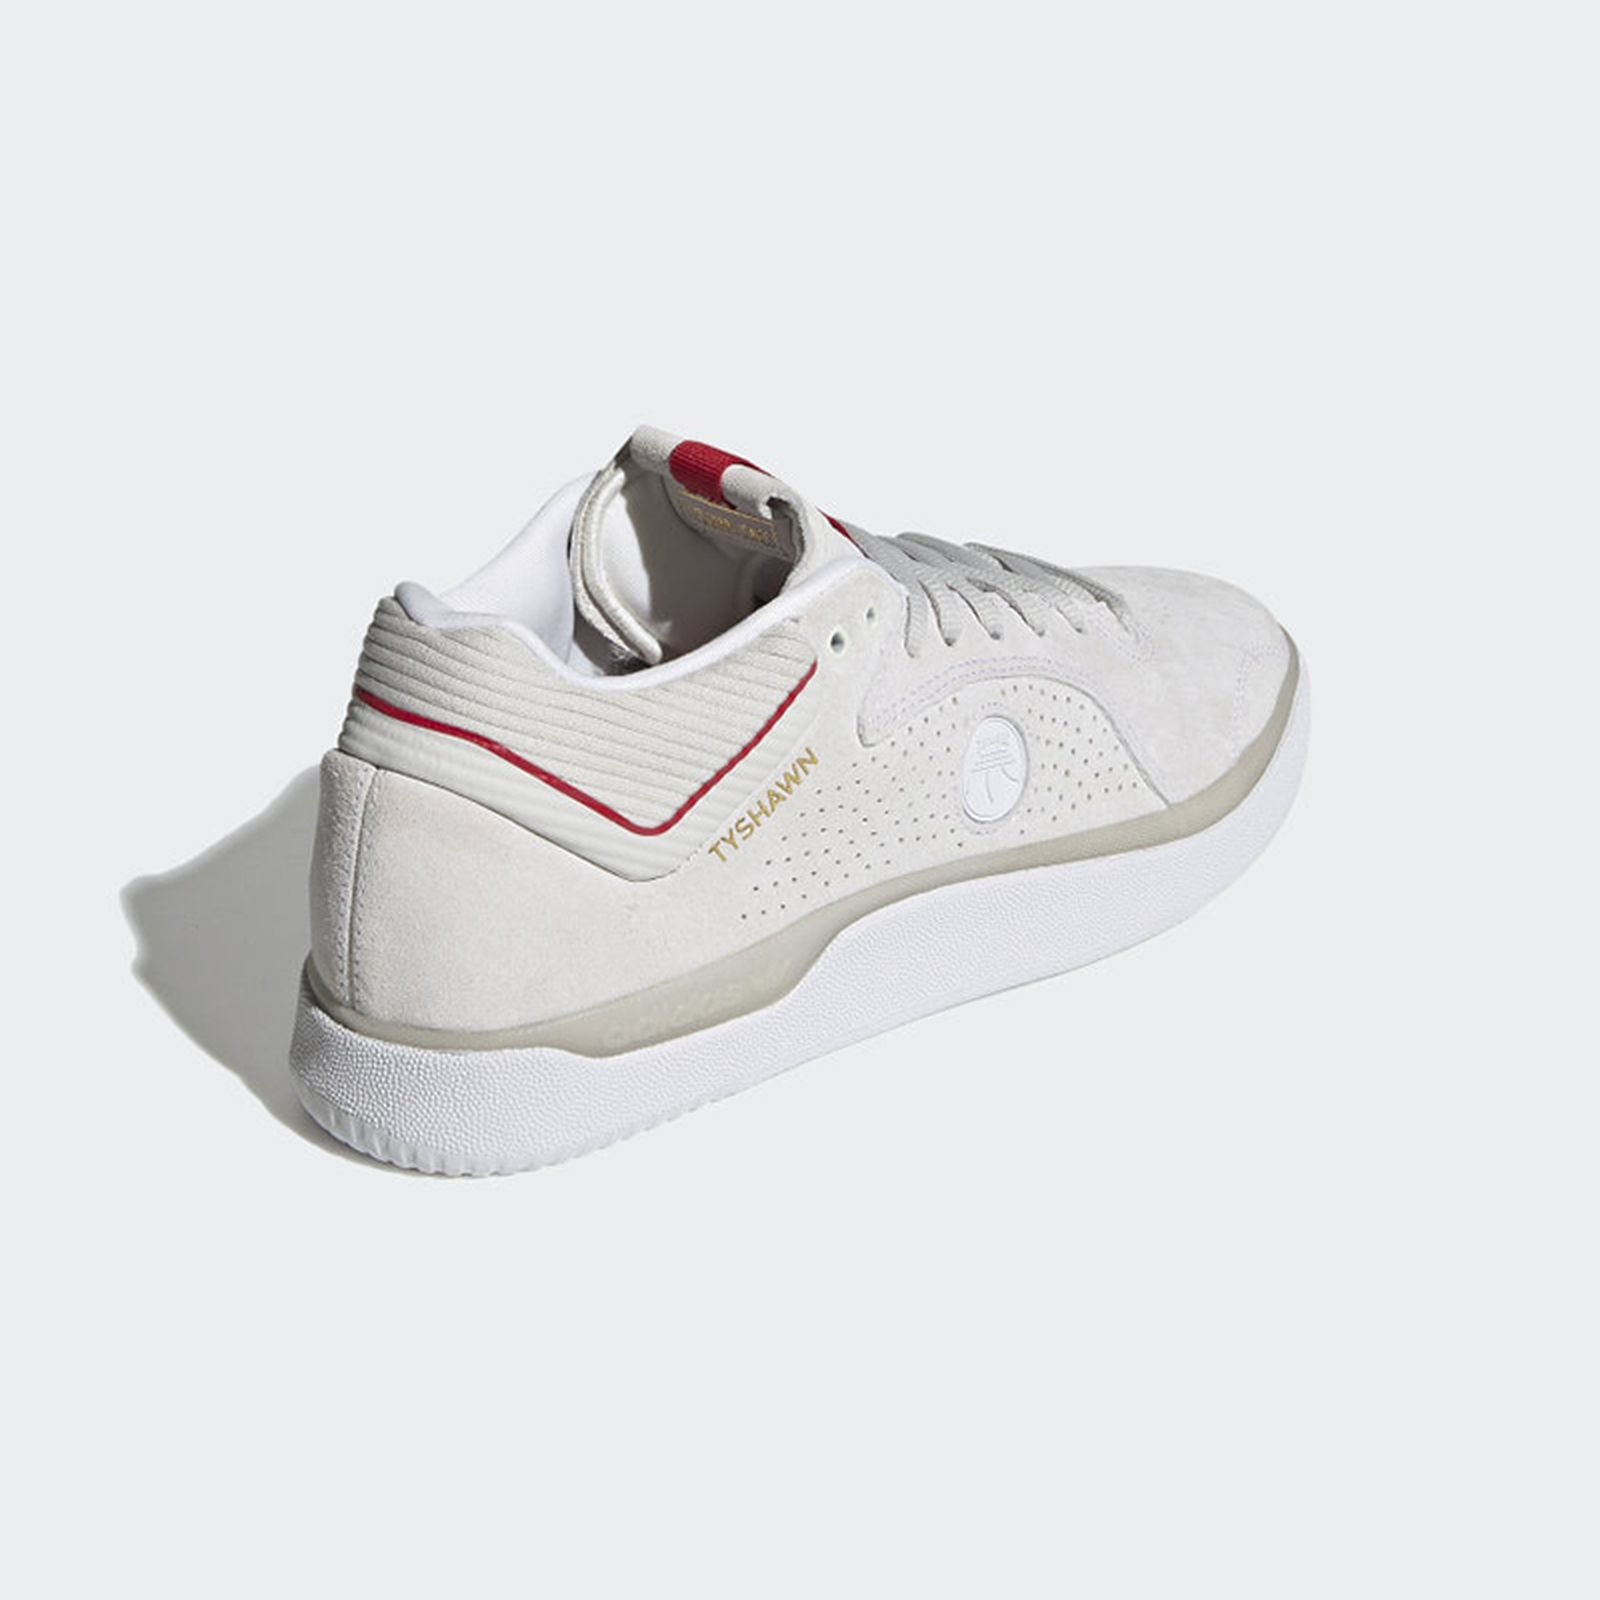 thrasher-adidas-superstar-adv-tyshawn-jones-release-date-price-1-11